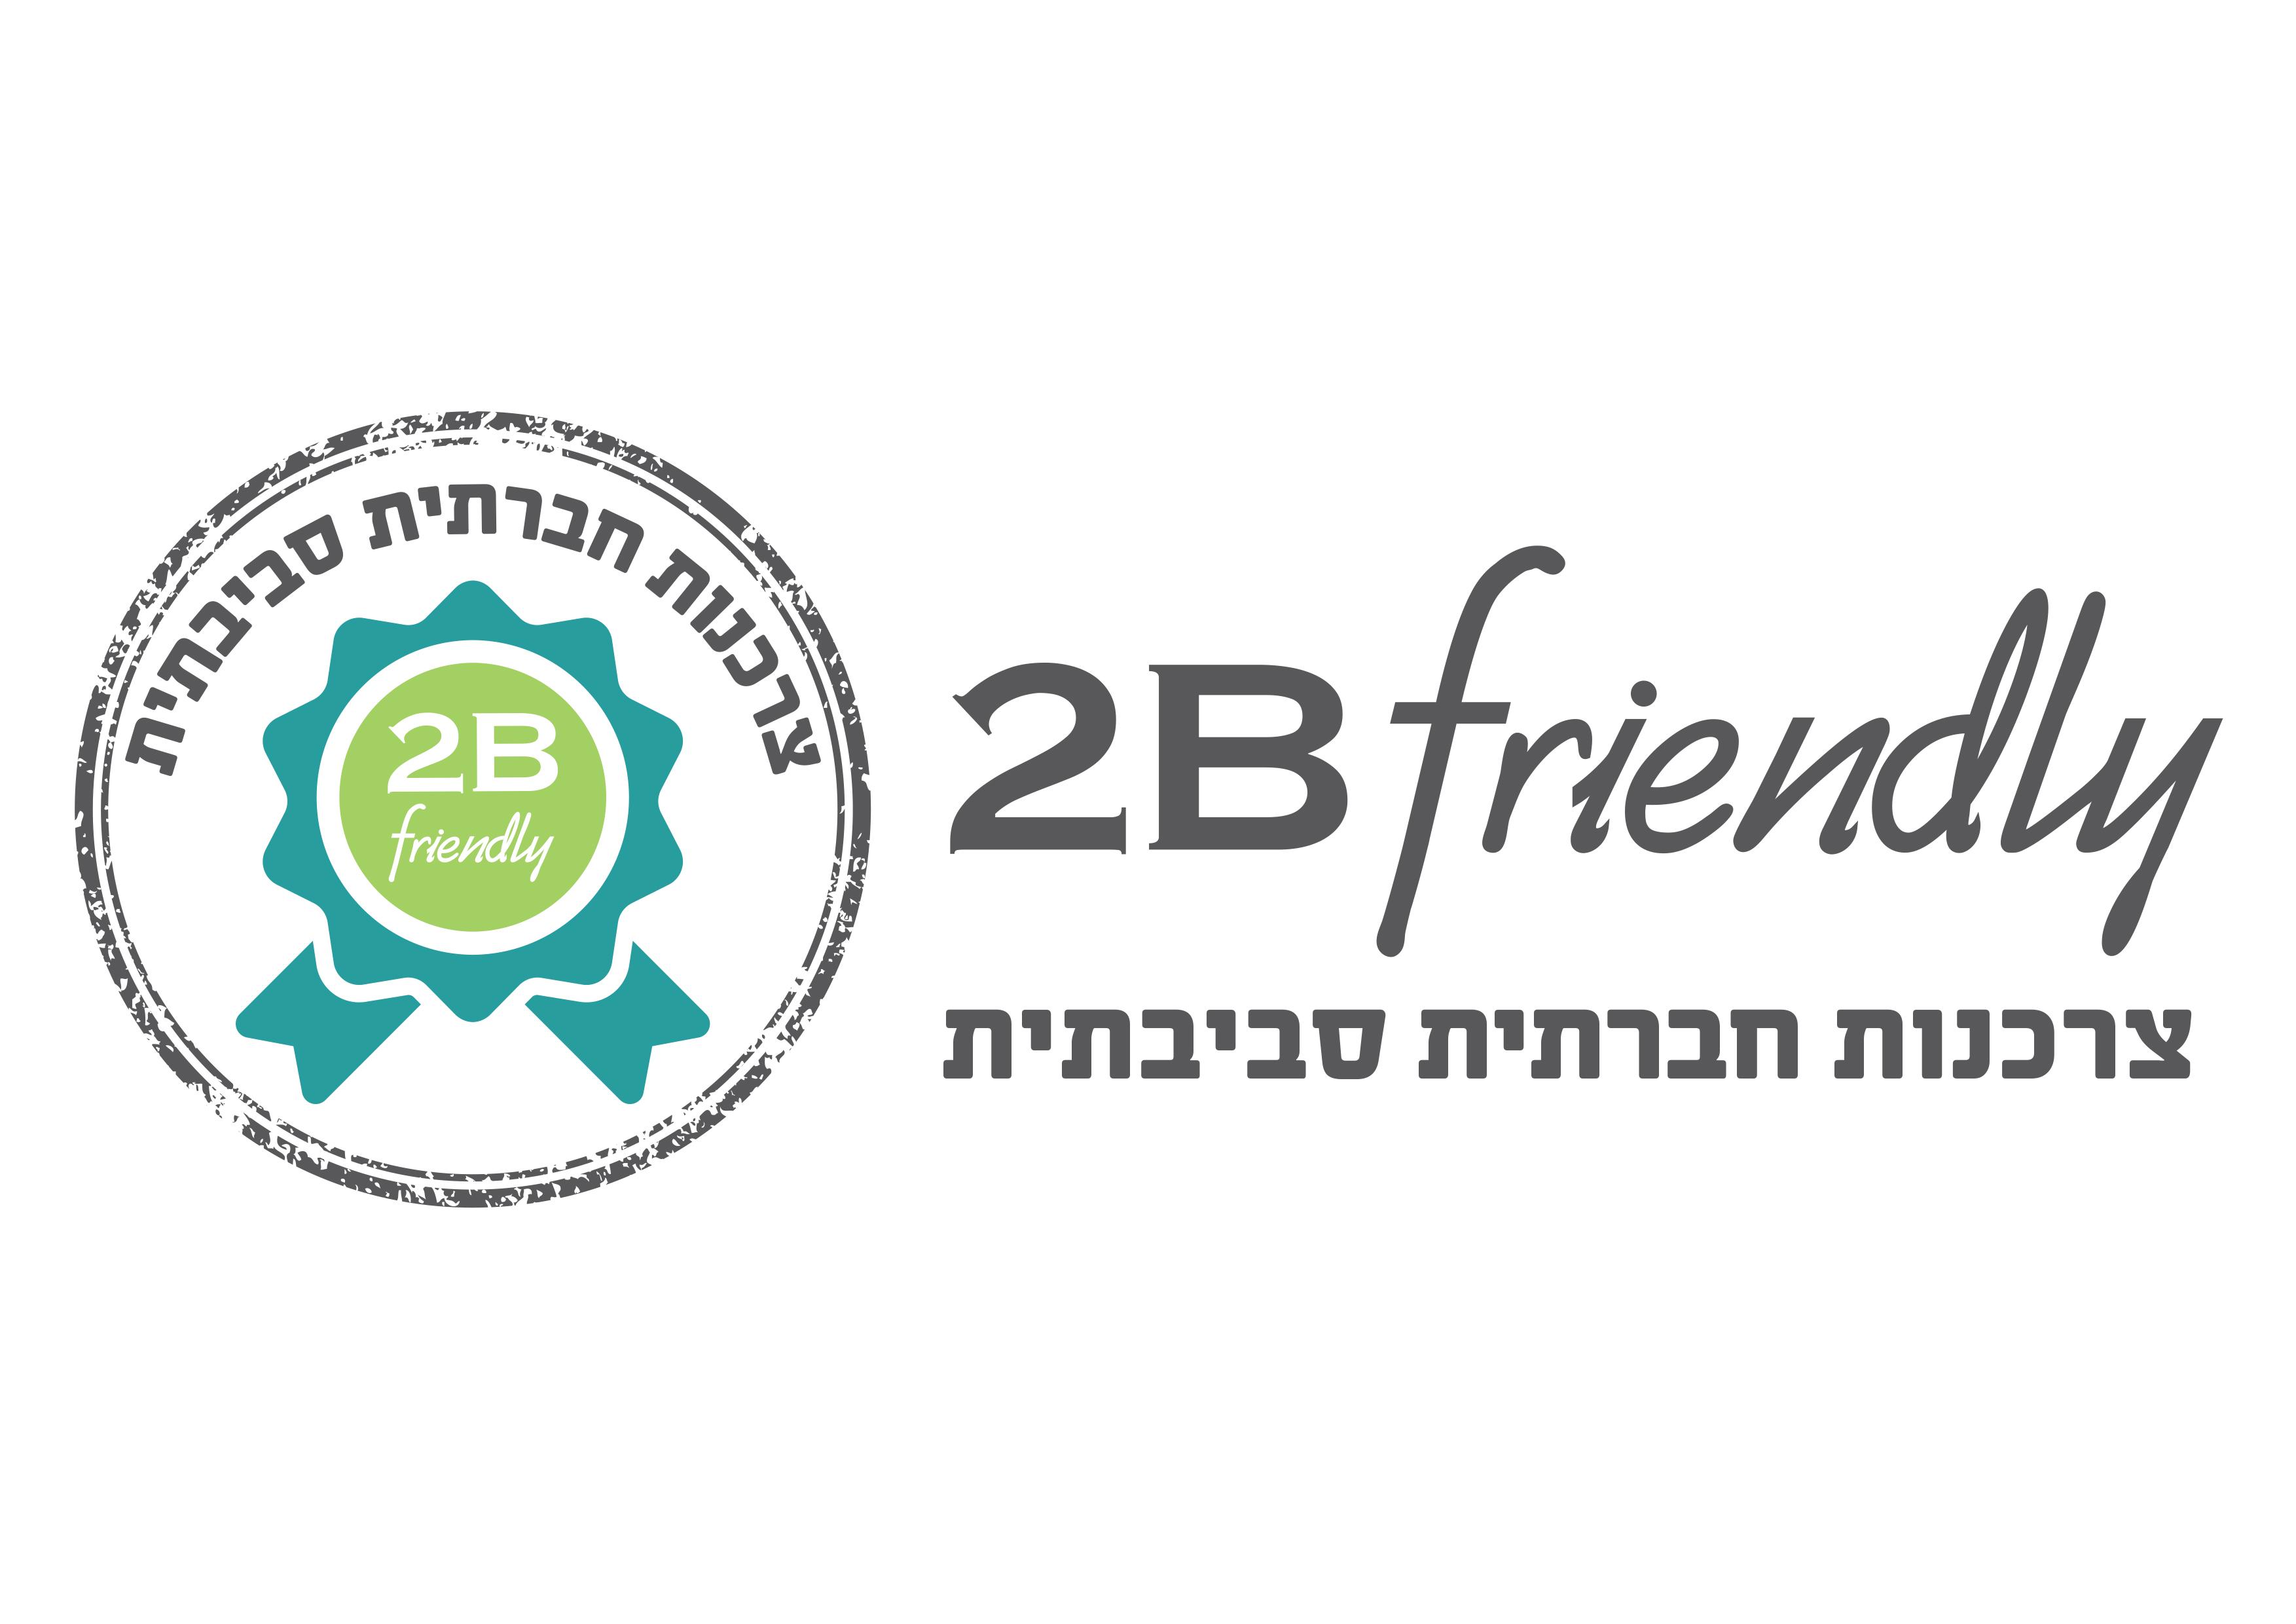 2bfriendly-logo-all-6